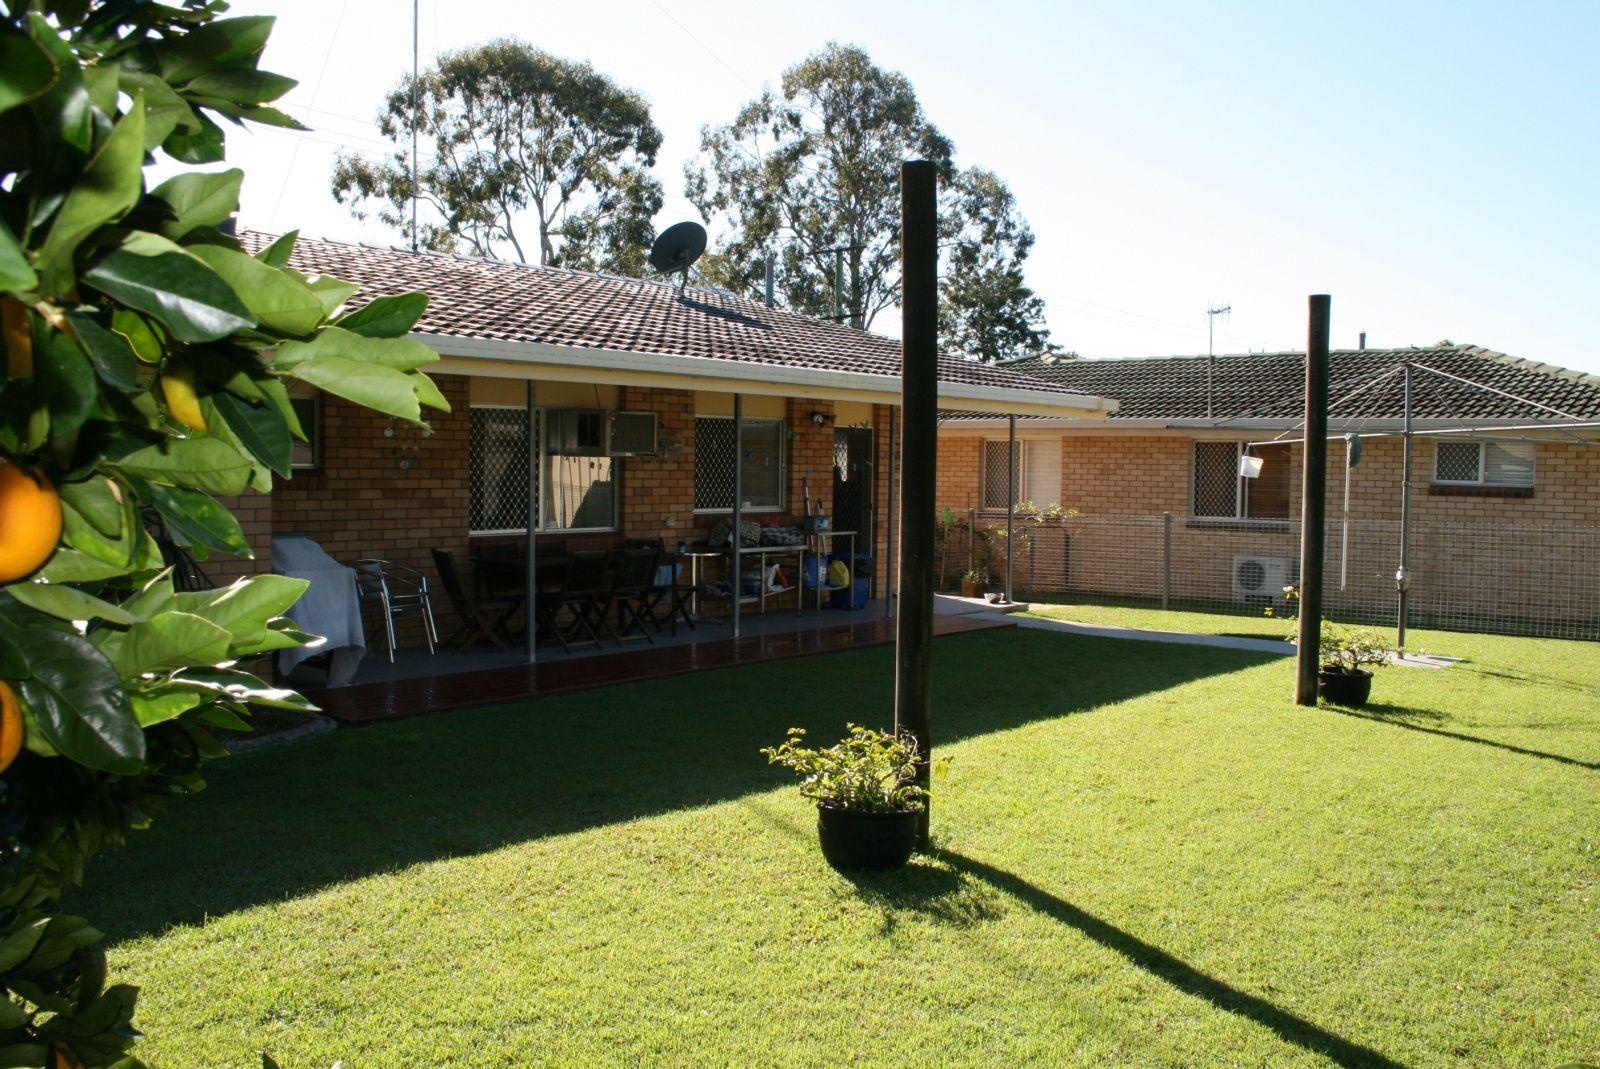 59 George Street, Tewantin QLD 4565